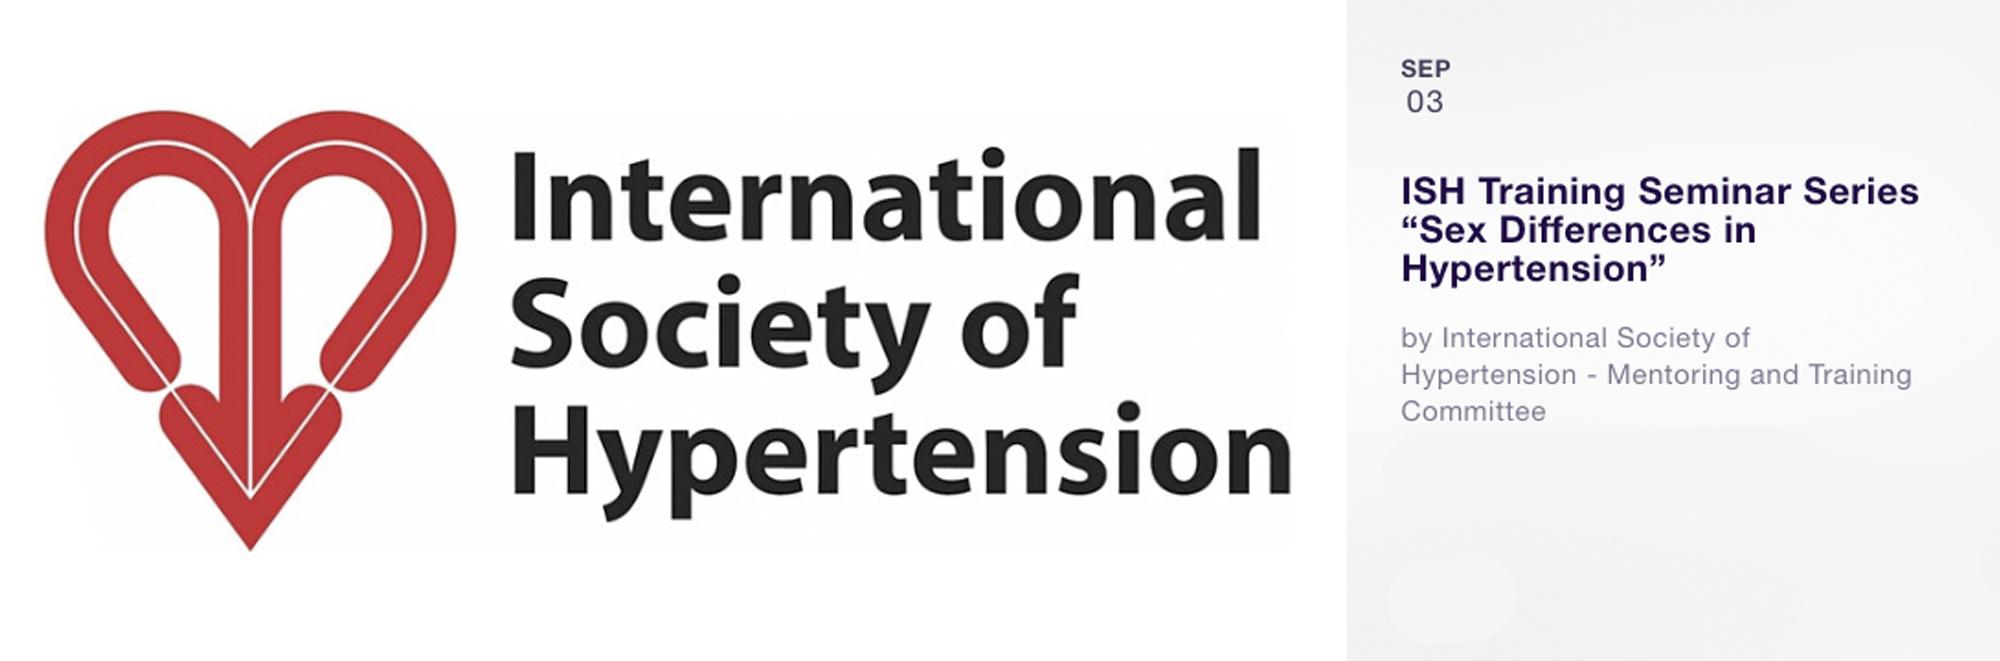 "International Society of Hypertension Training Seminar Series ""Sex Differences in Hypertension"""